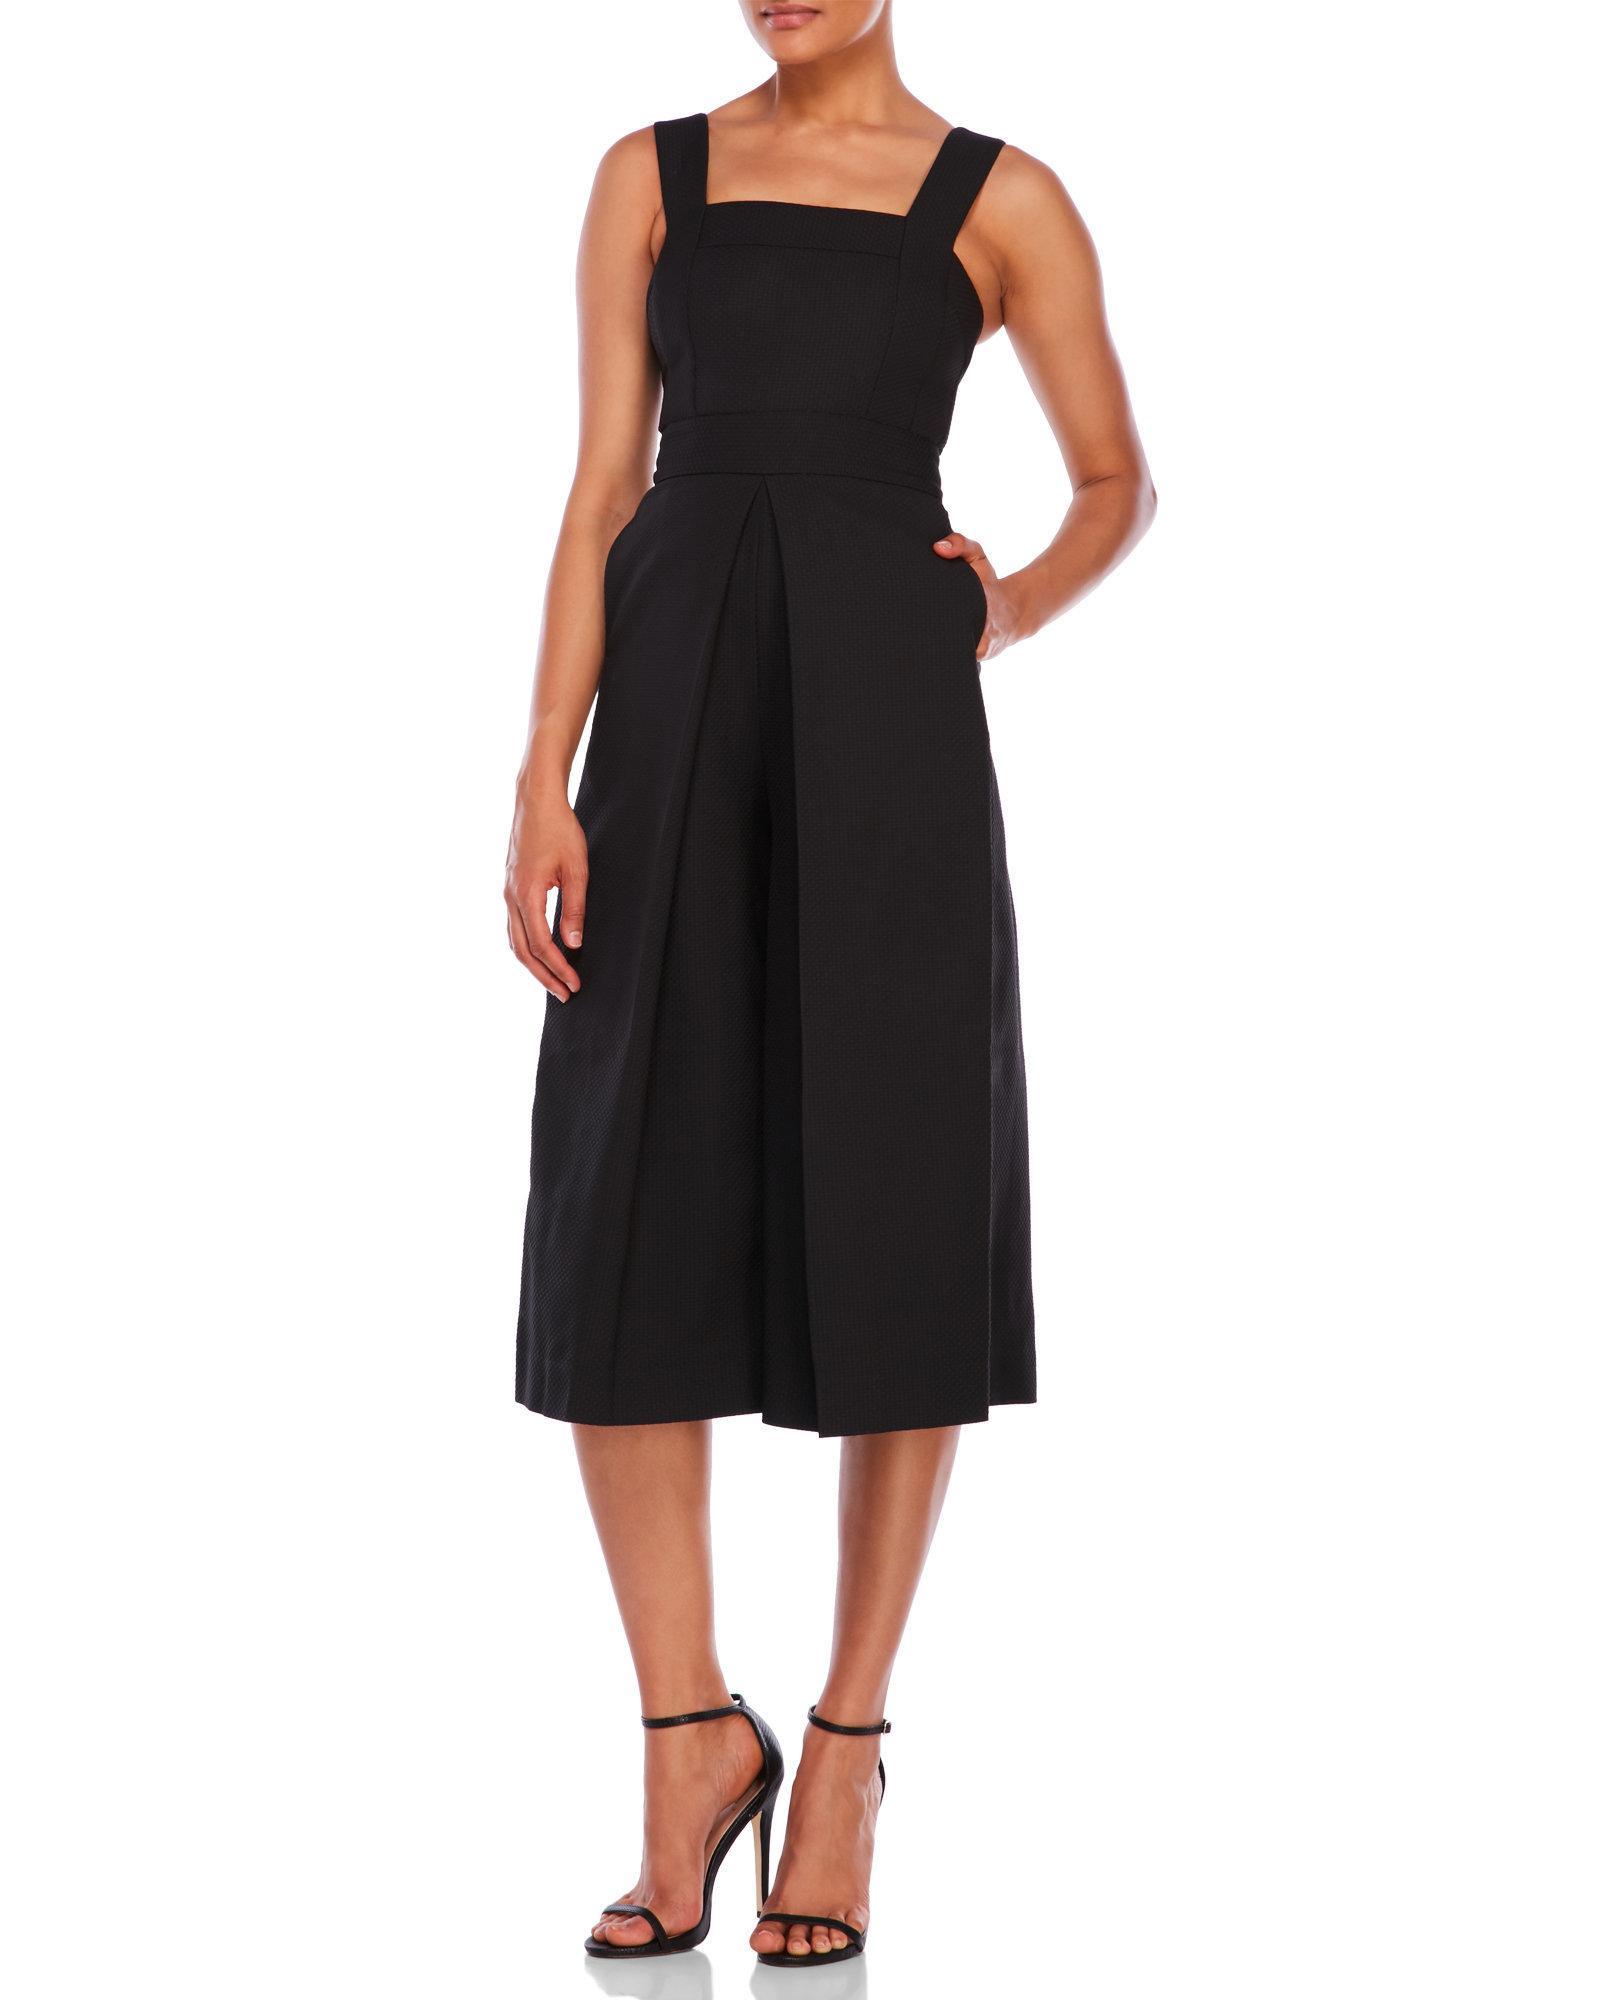 8e4a558c374 Lyst - Kendall + Kylie Jacquard Culotte Jumpsuit in Black